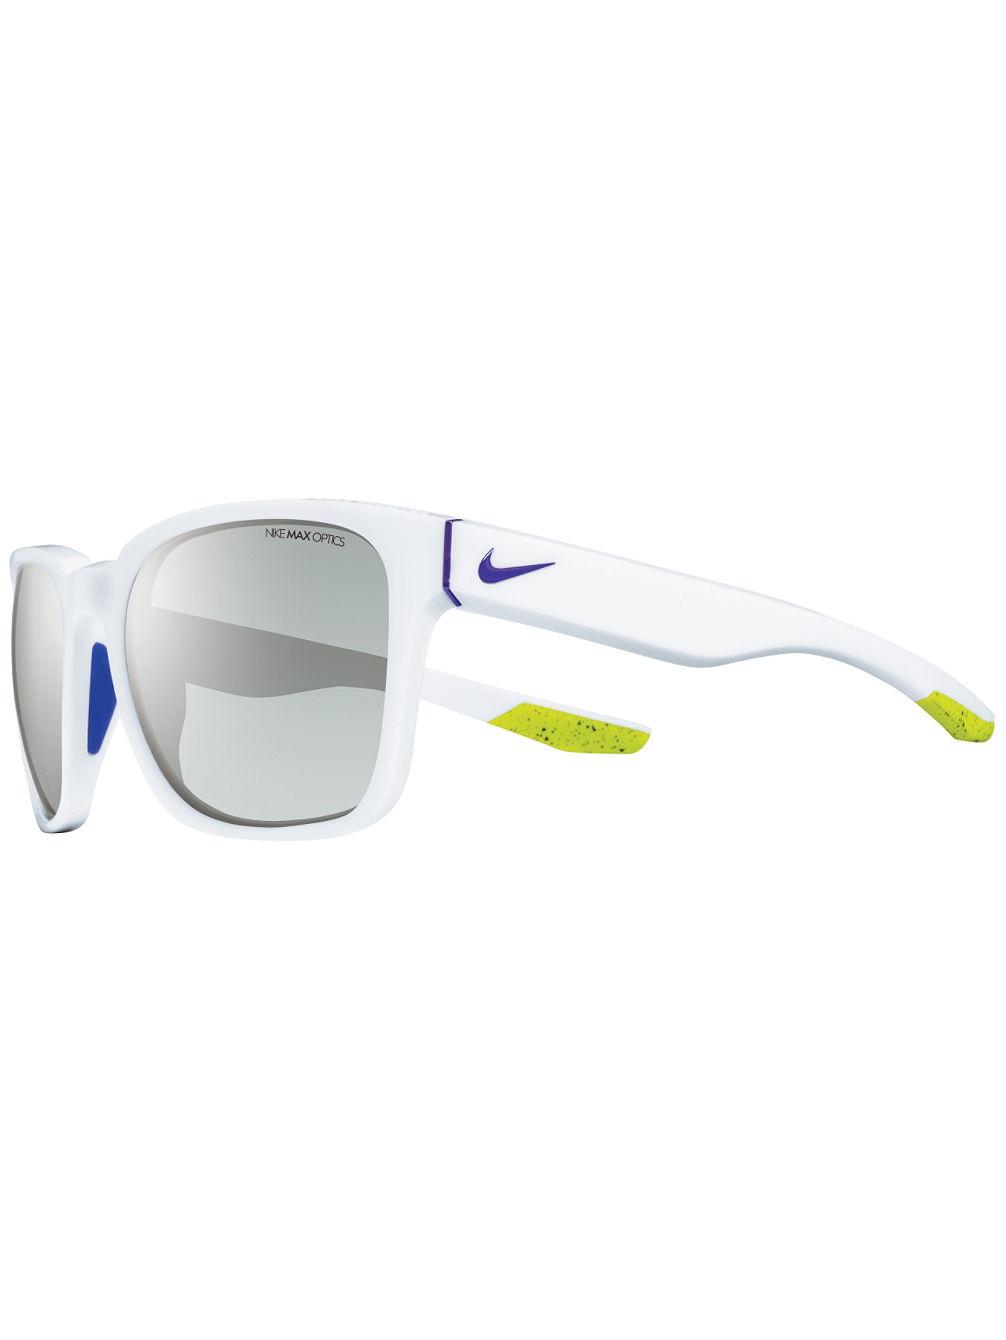 Nike Recover R white/dark concord - nike - blue-tomato.com